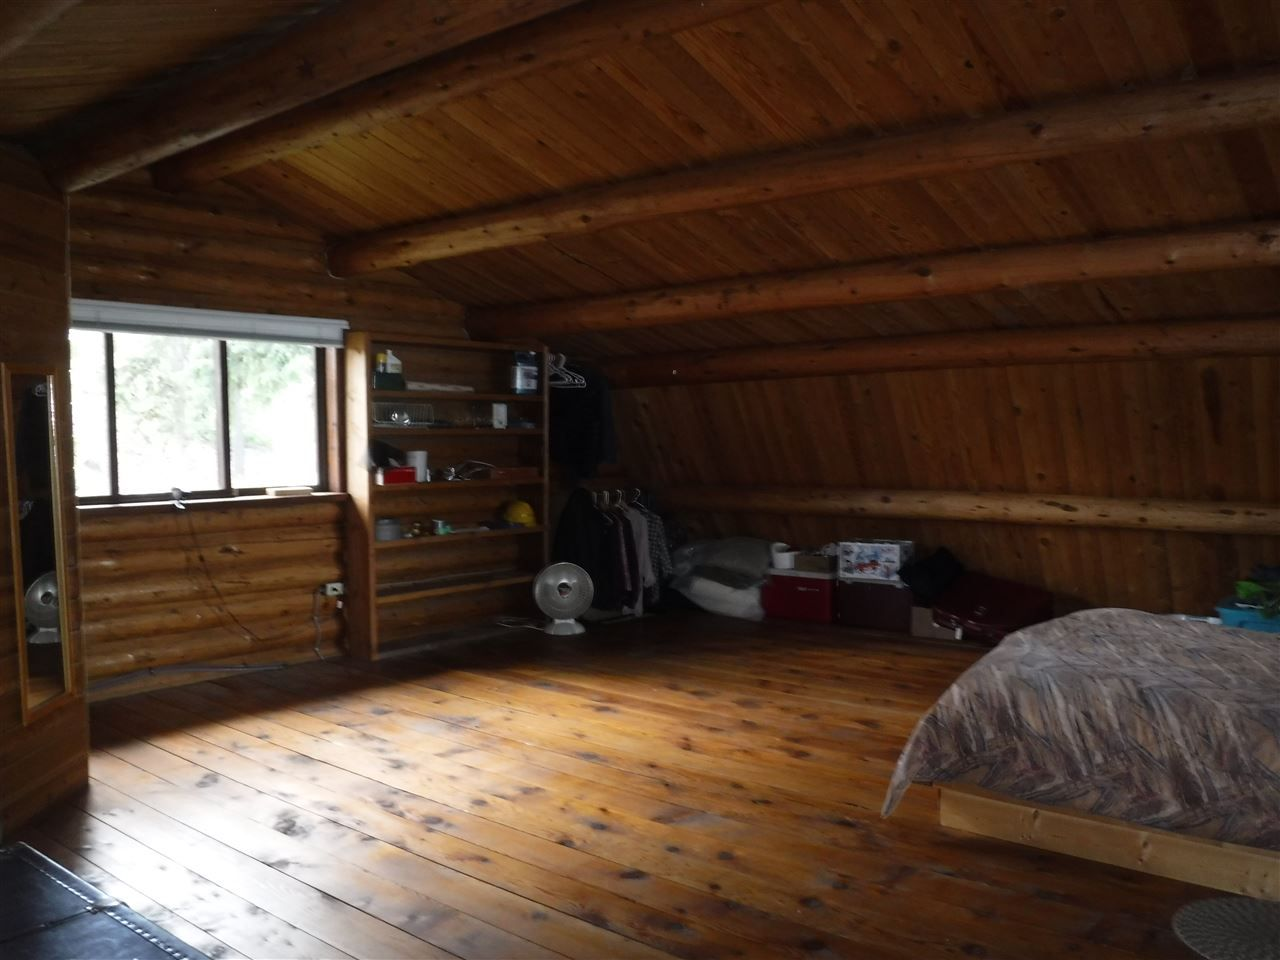 Photo 13: Photos: 3056 ELSEY Road in Williams Lake: Williams Lake - Rural West House for sale (Williams Lake (Zone 27))  : MLS®# R2472269